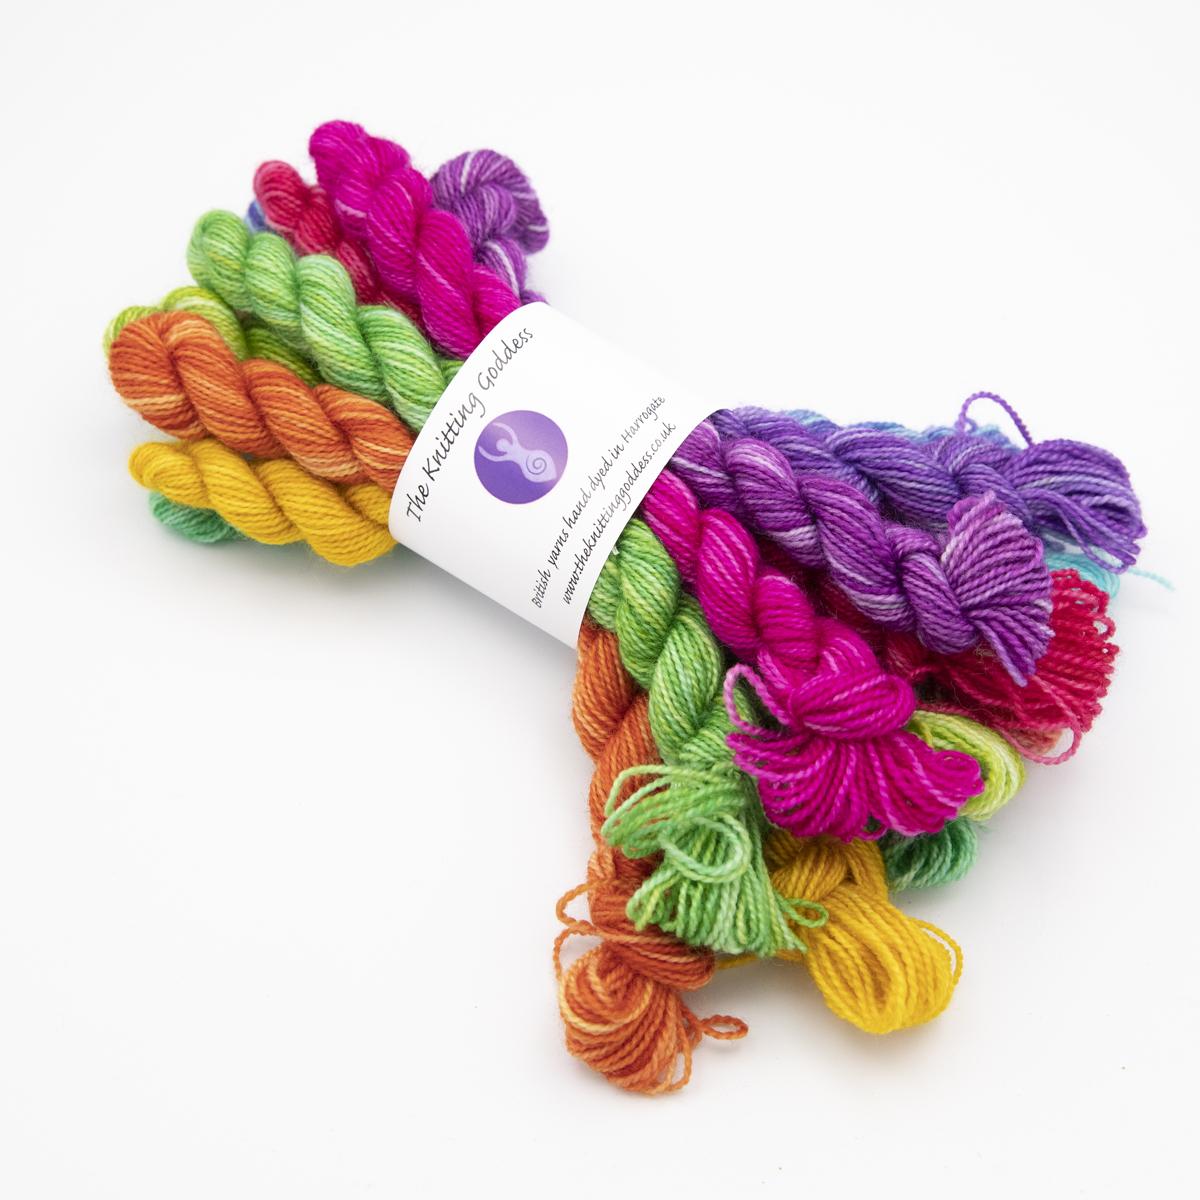 Printer ink hues colourway 4ply BFL nylon mini skeins of yarn